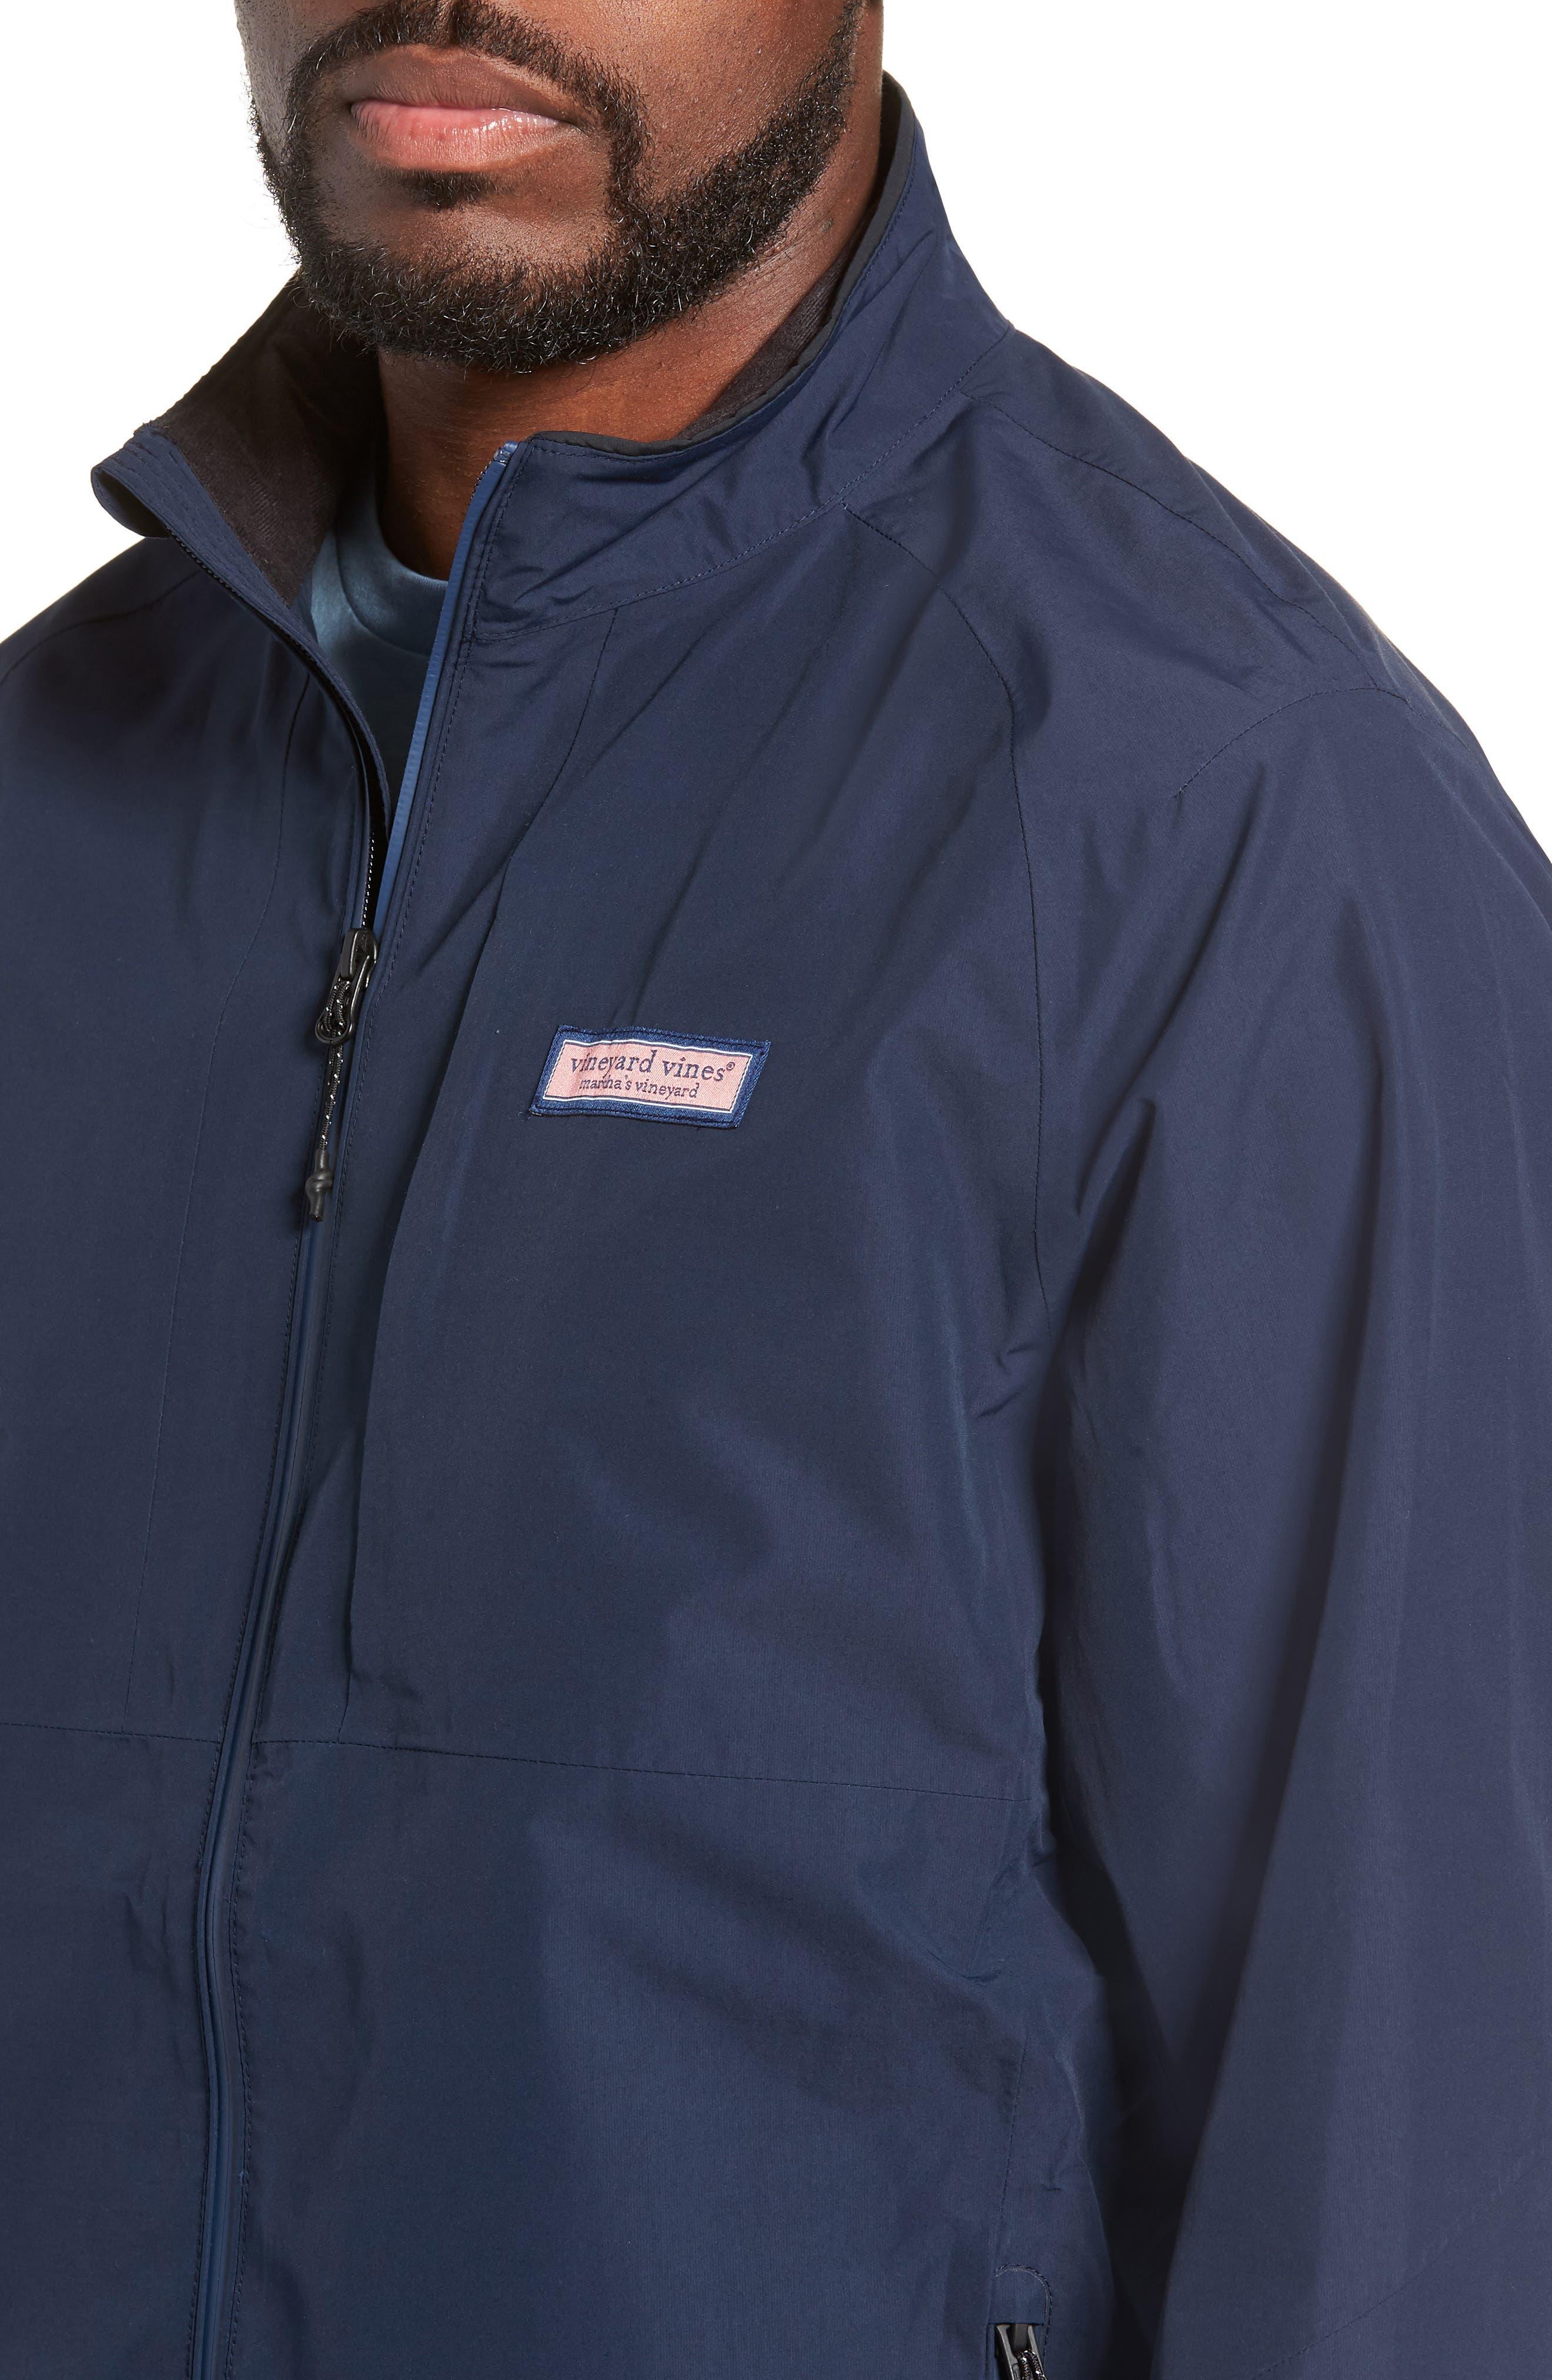 Regatta Performance Jacket,                             Alternate thumbnail 4, color,                             410